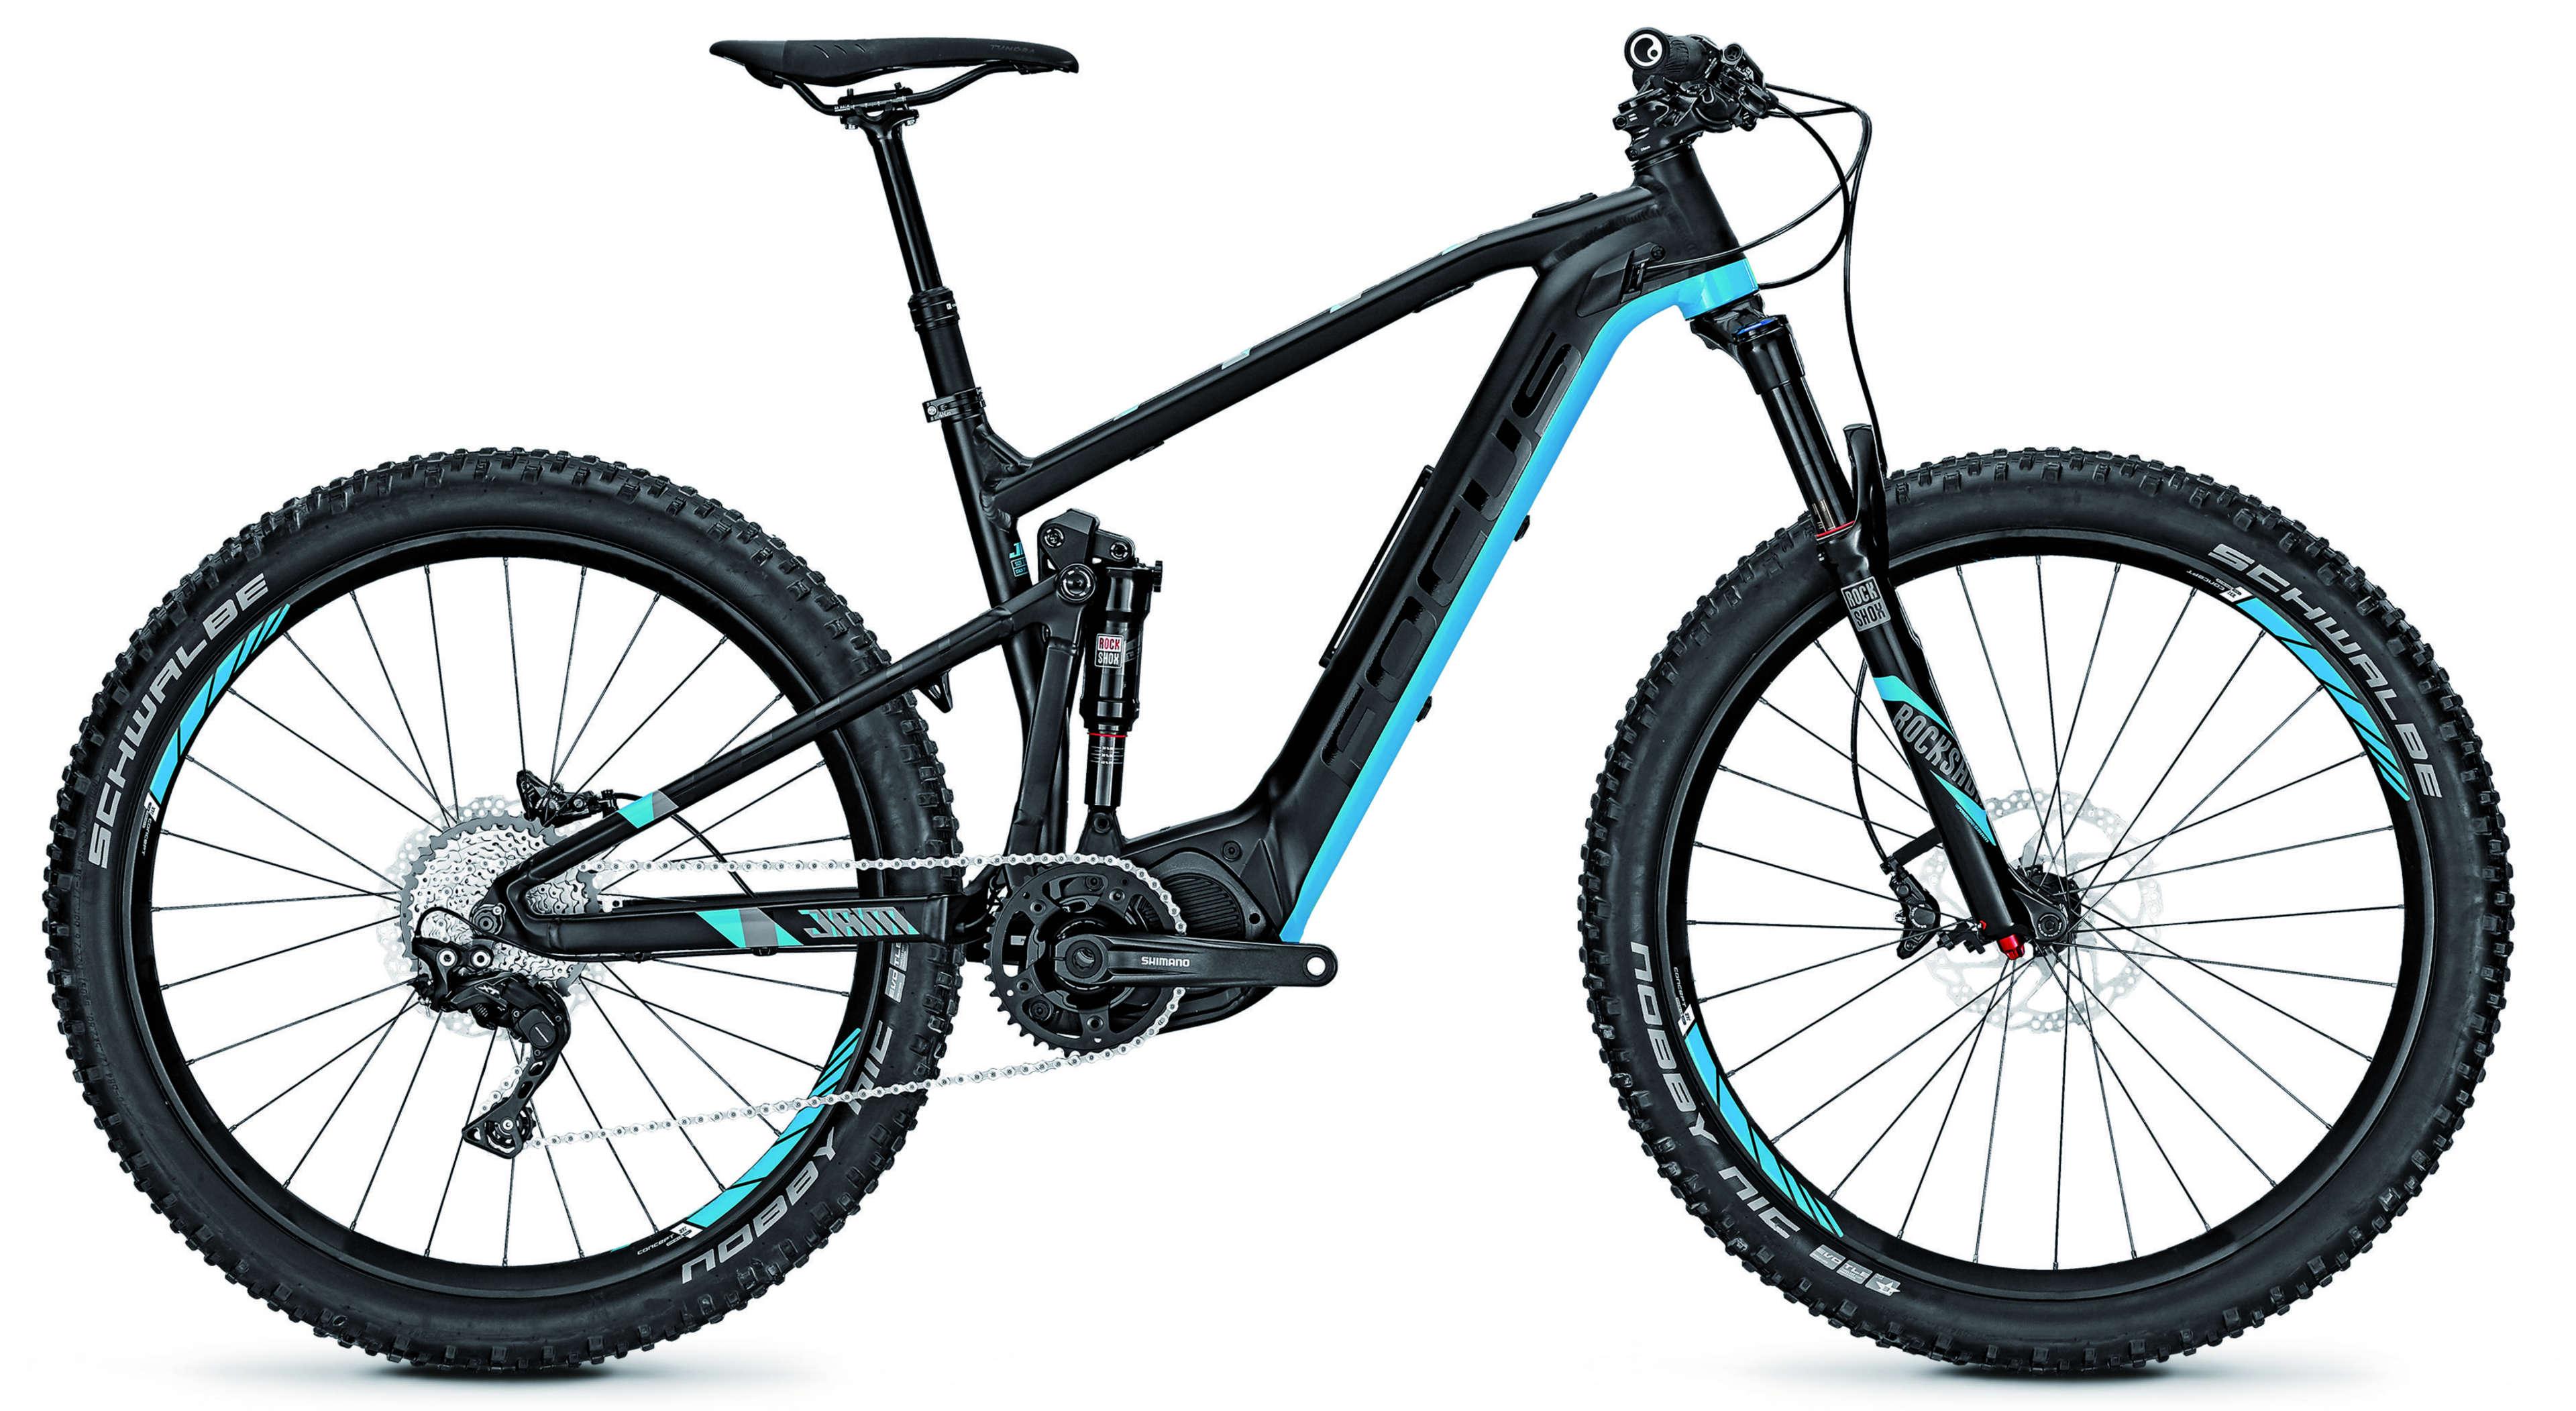 focus e bike jam2 pro plus 11g 10 5ah 36v eurorad. Black Bedroom Furniture Sets. Home Design Ideas